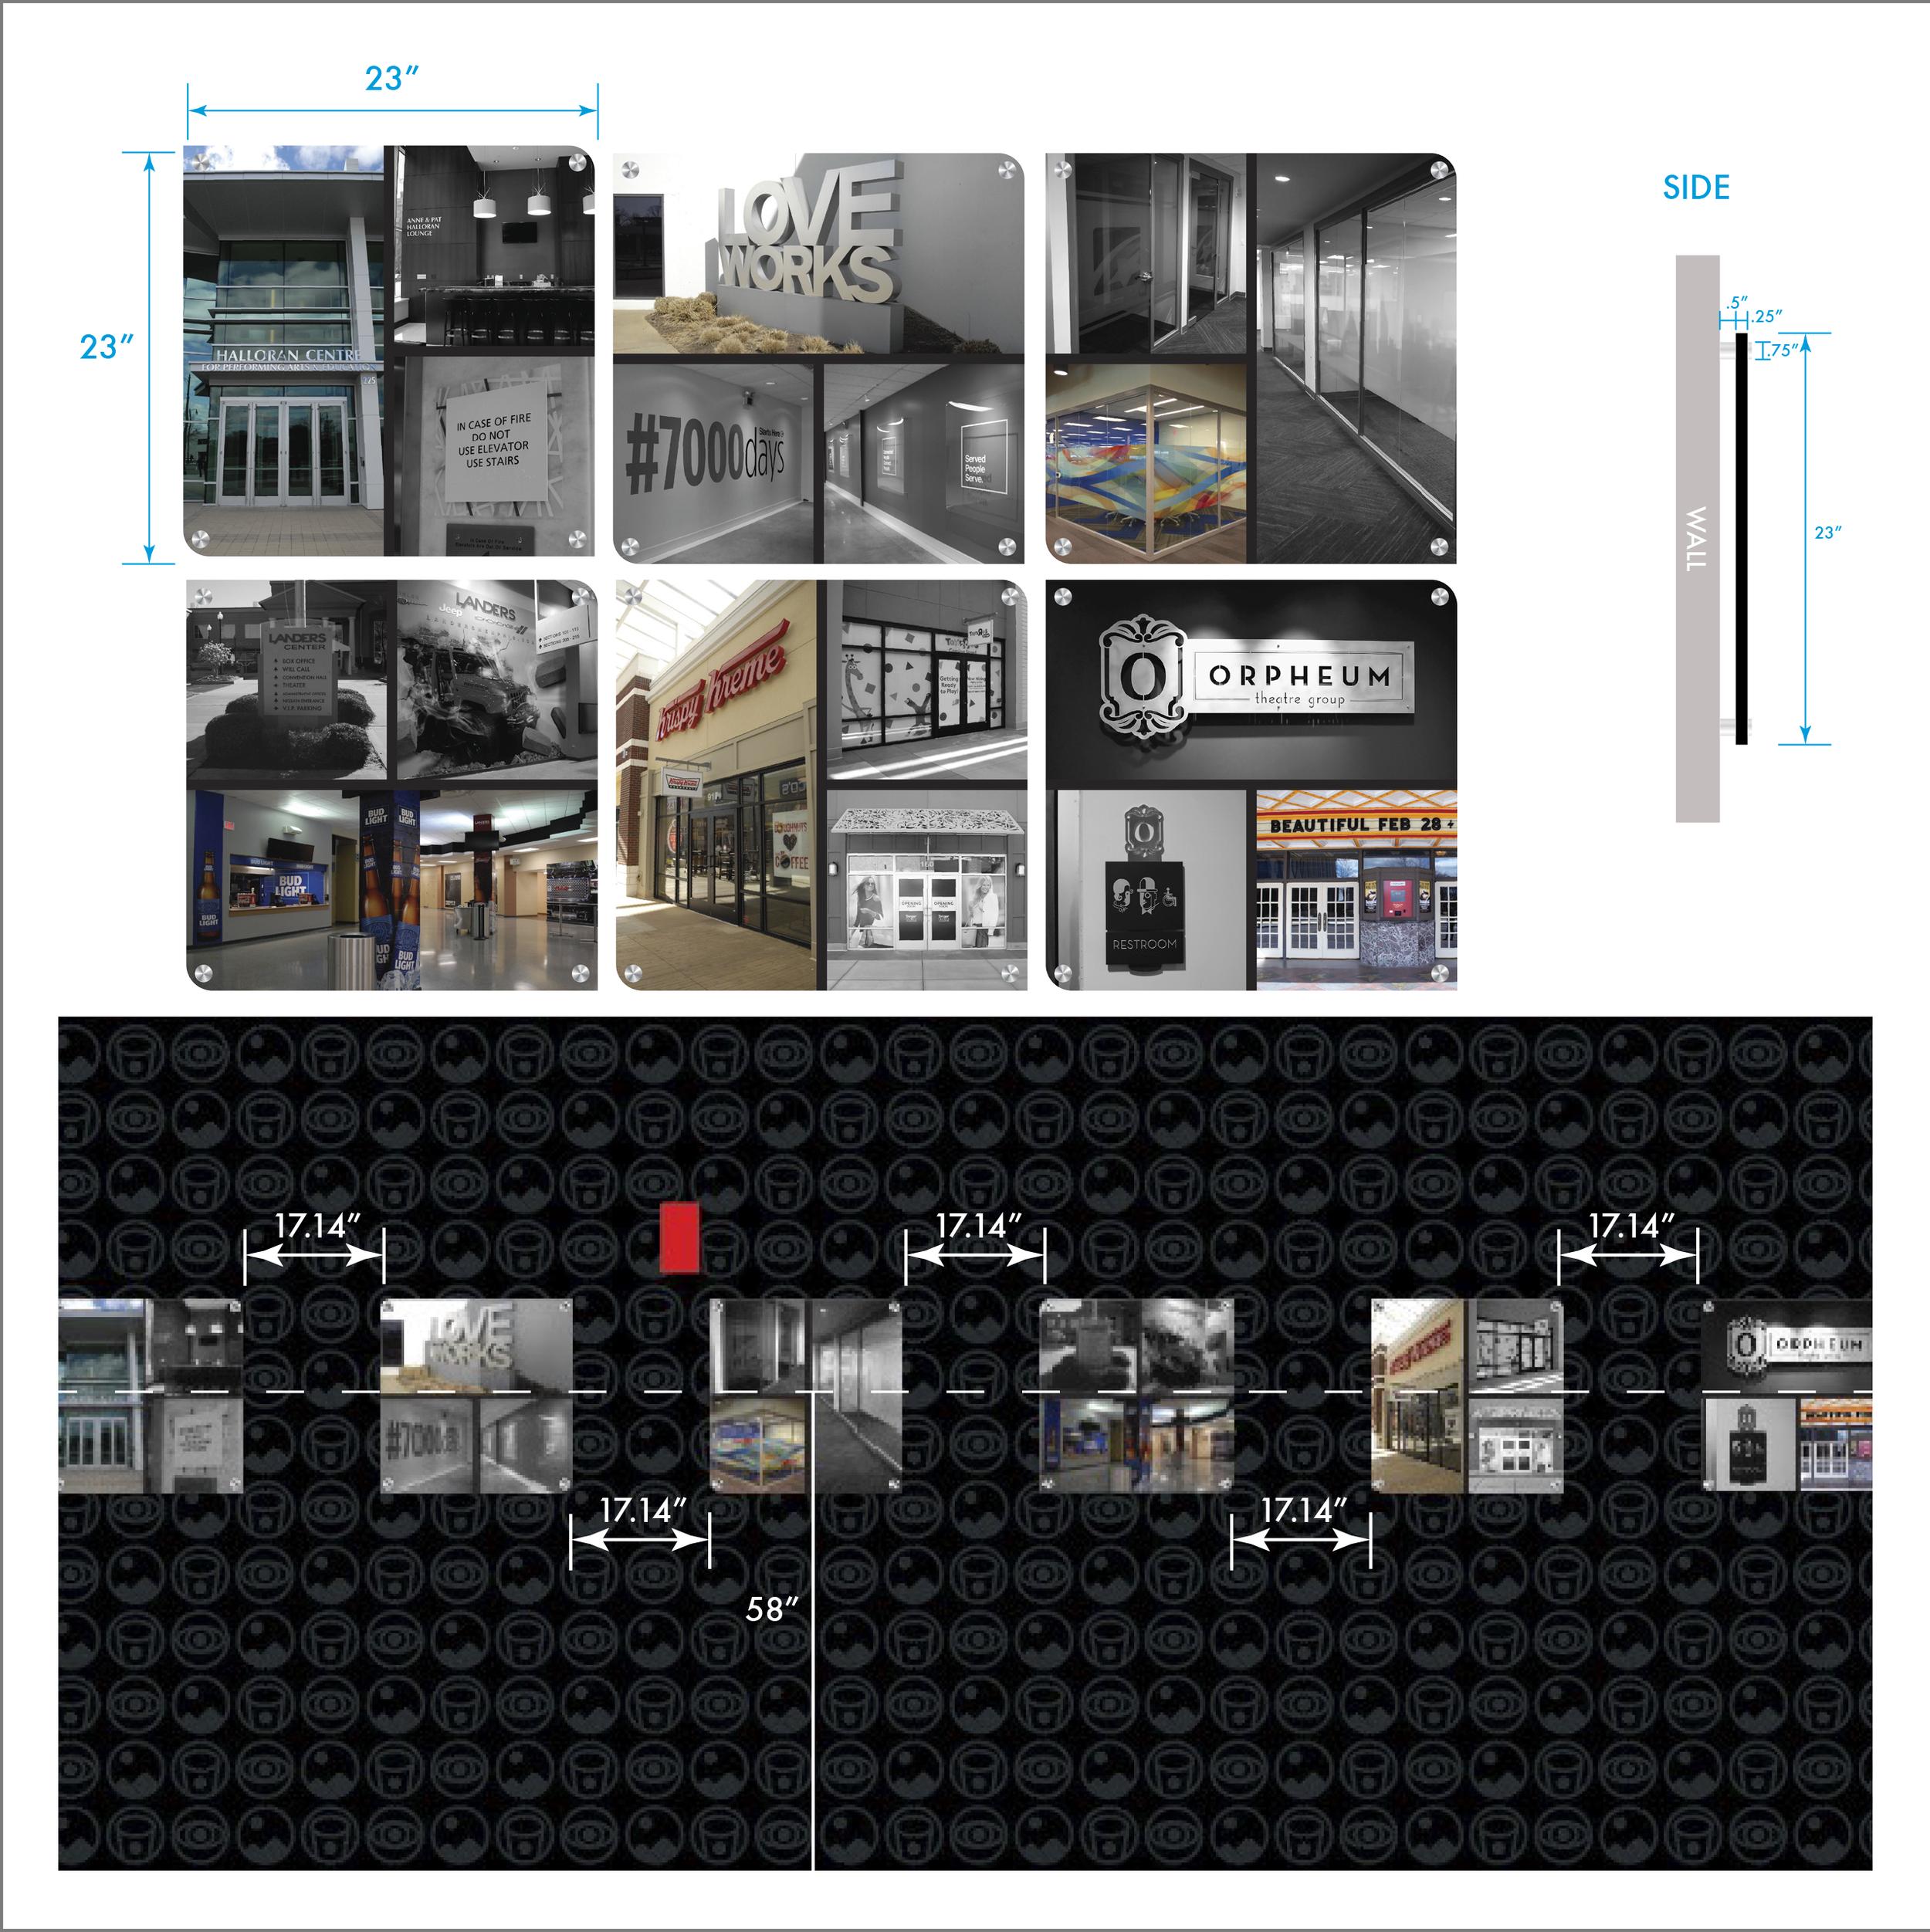 LSIGraphics_Environmental-Graphics_Expand-Your-Brand-Wall_Horizontal-Lockup_Dreamcapture_Memphis-TN_3